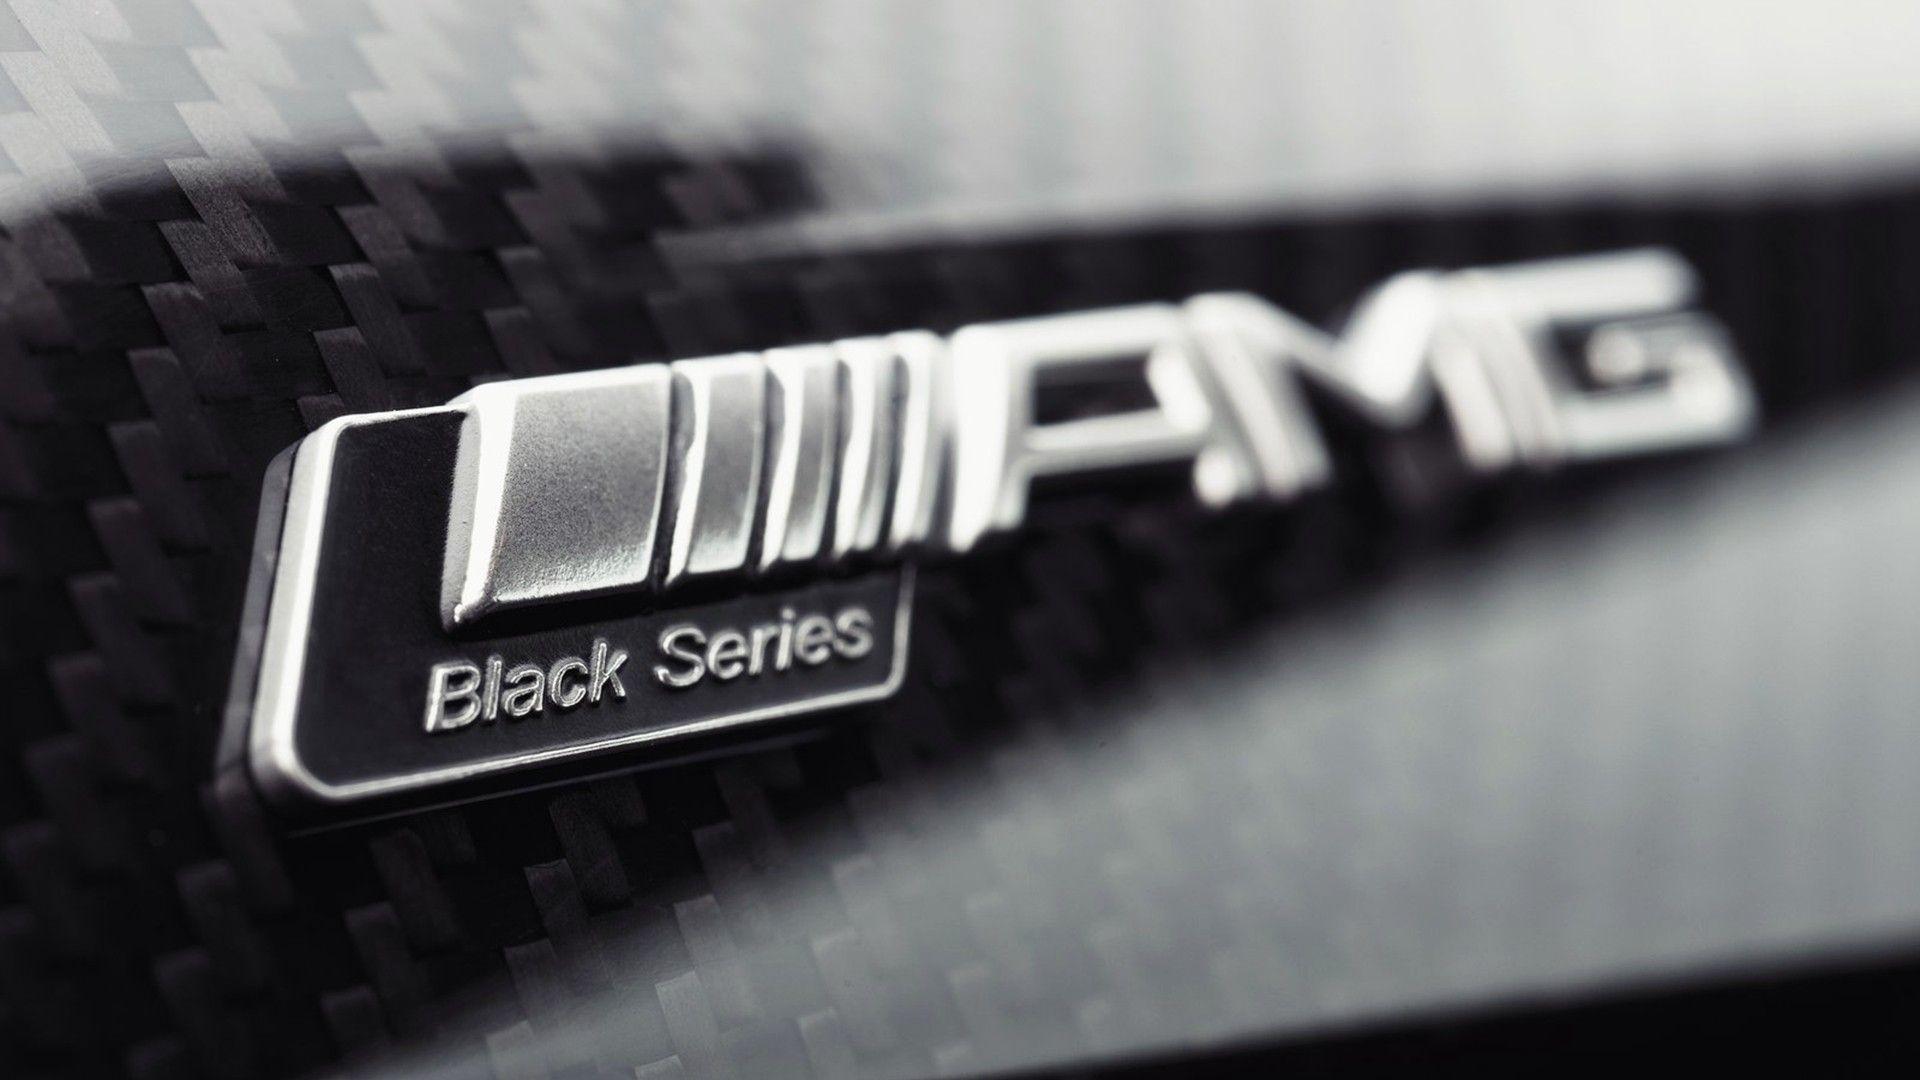 1920x1080 Amg Black Series Desktop Pc And Mac Wallpaper Black Series Amg C63 Amg Black Series